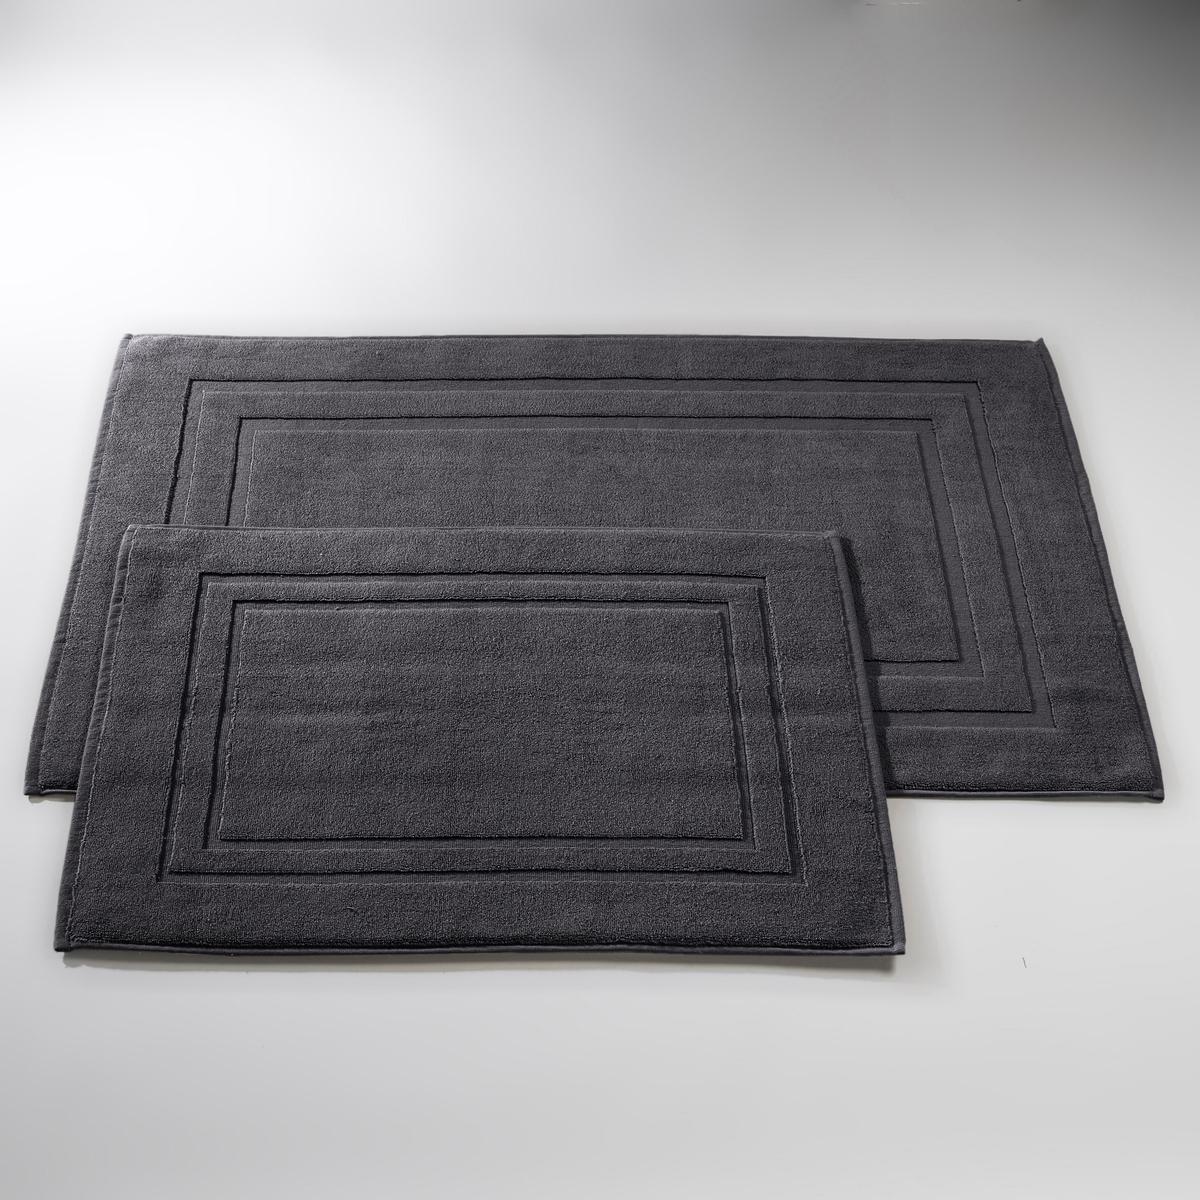 Tappeto da bagno 1100 g/m²